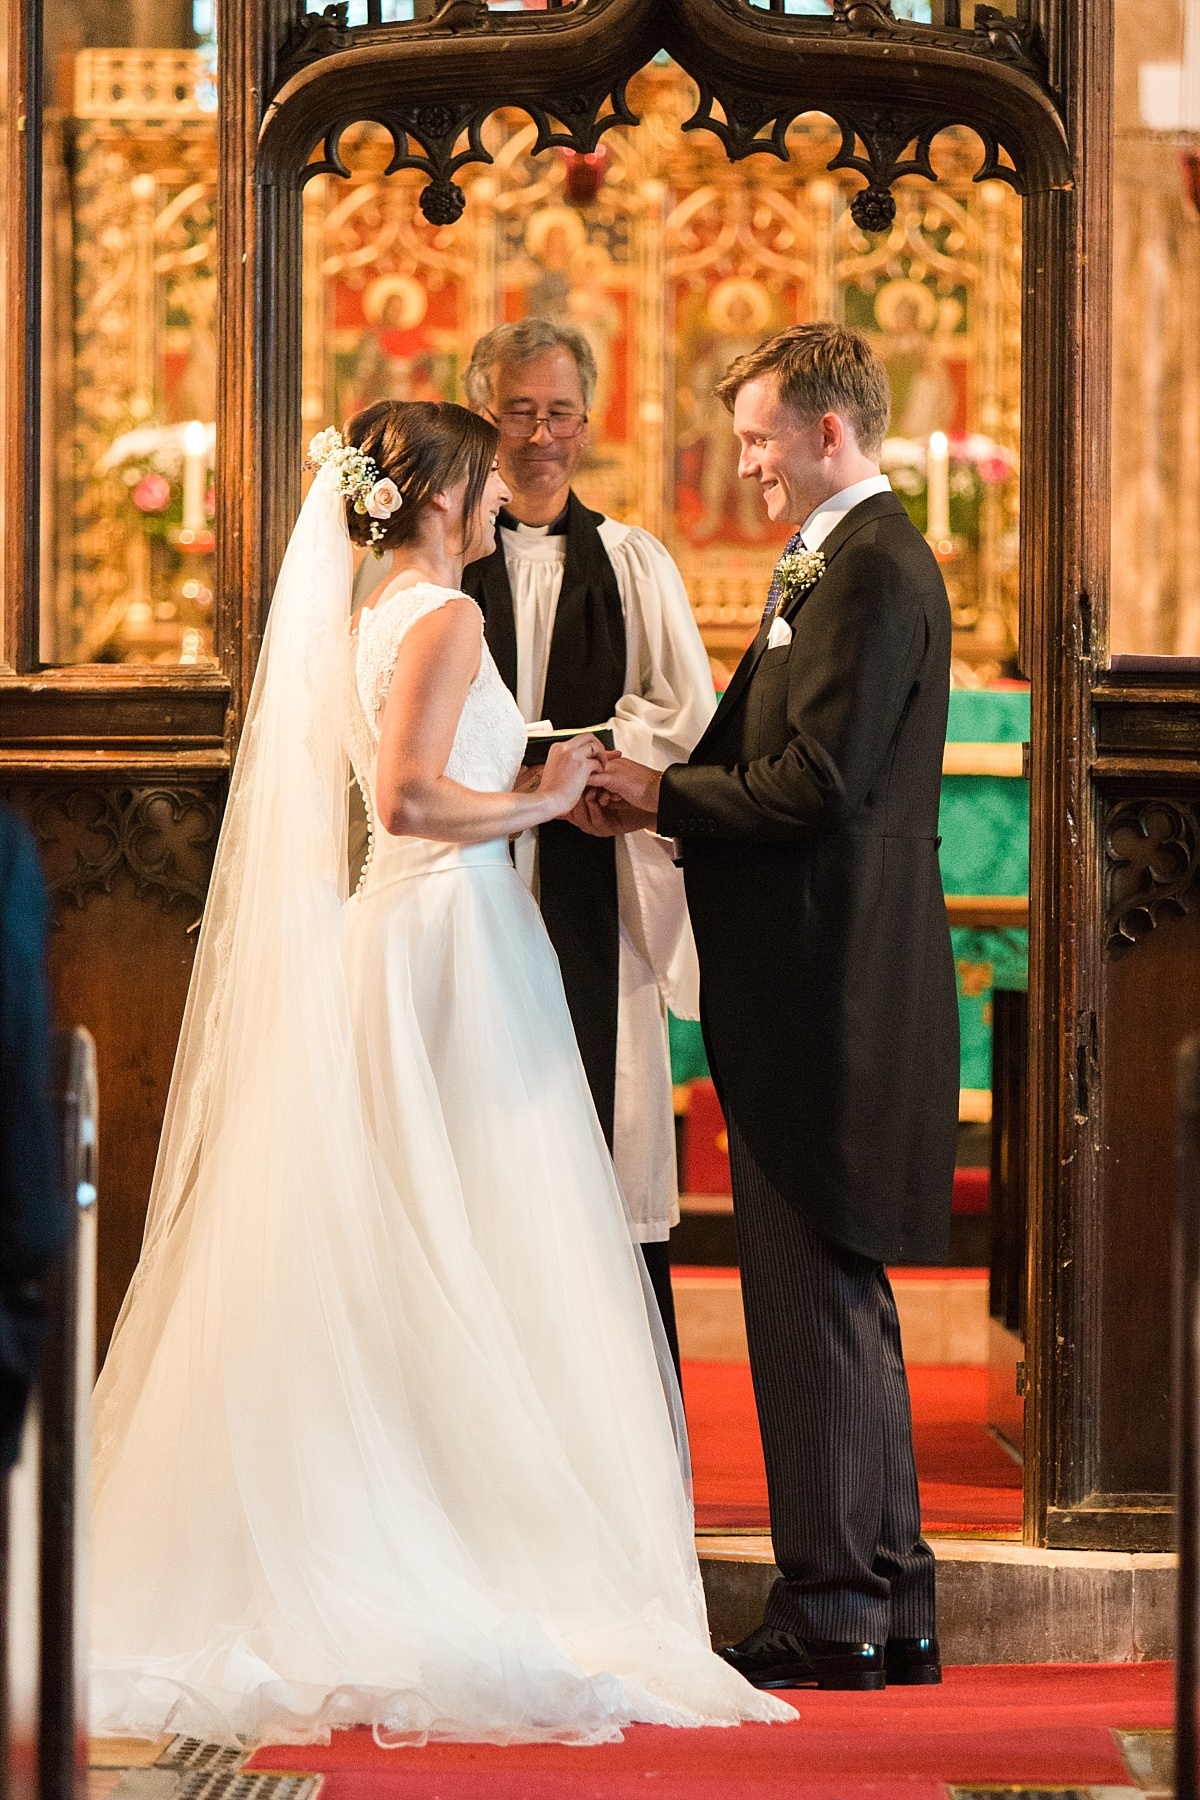 lincolnshire wedding photographer029